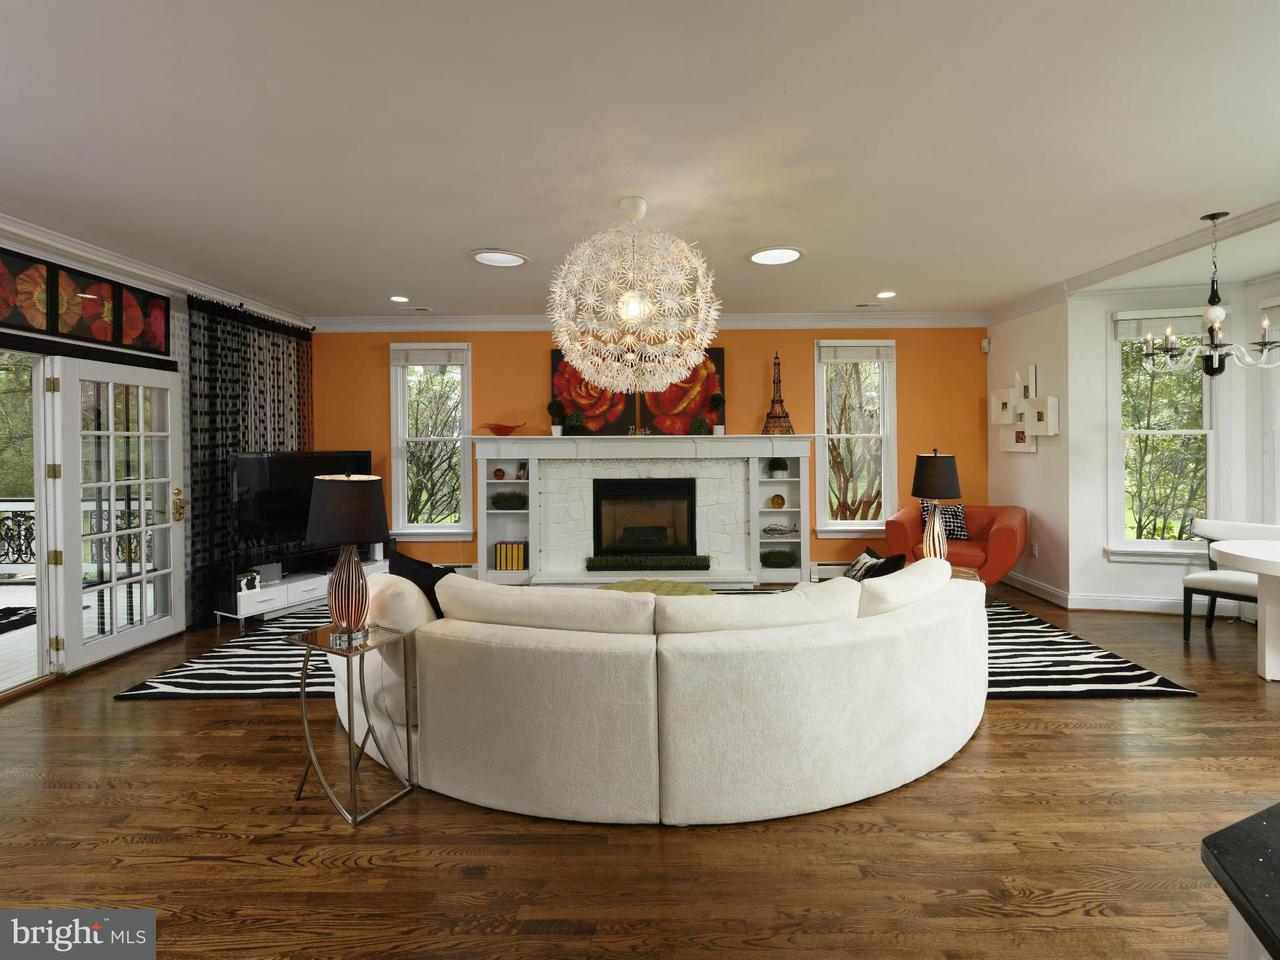 Single Family Home for Sale at 10130 Blake Lane 10130 Blake Lane Oakton, Virginia 22124 United States